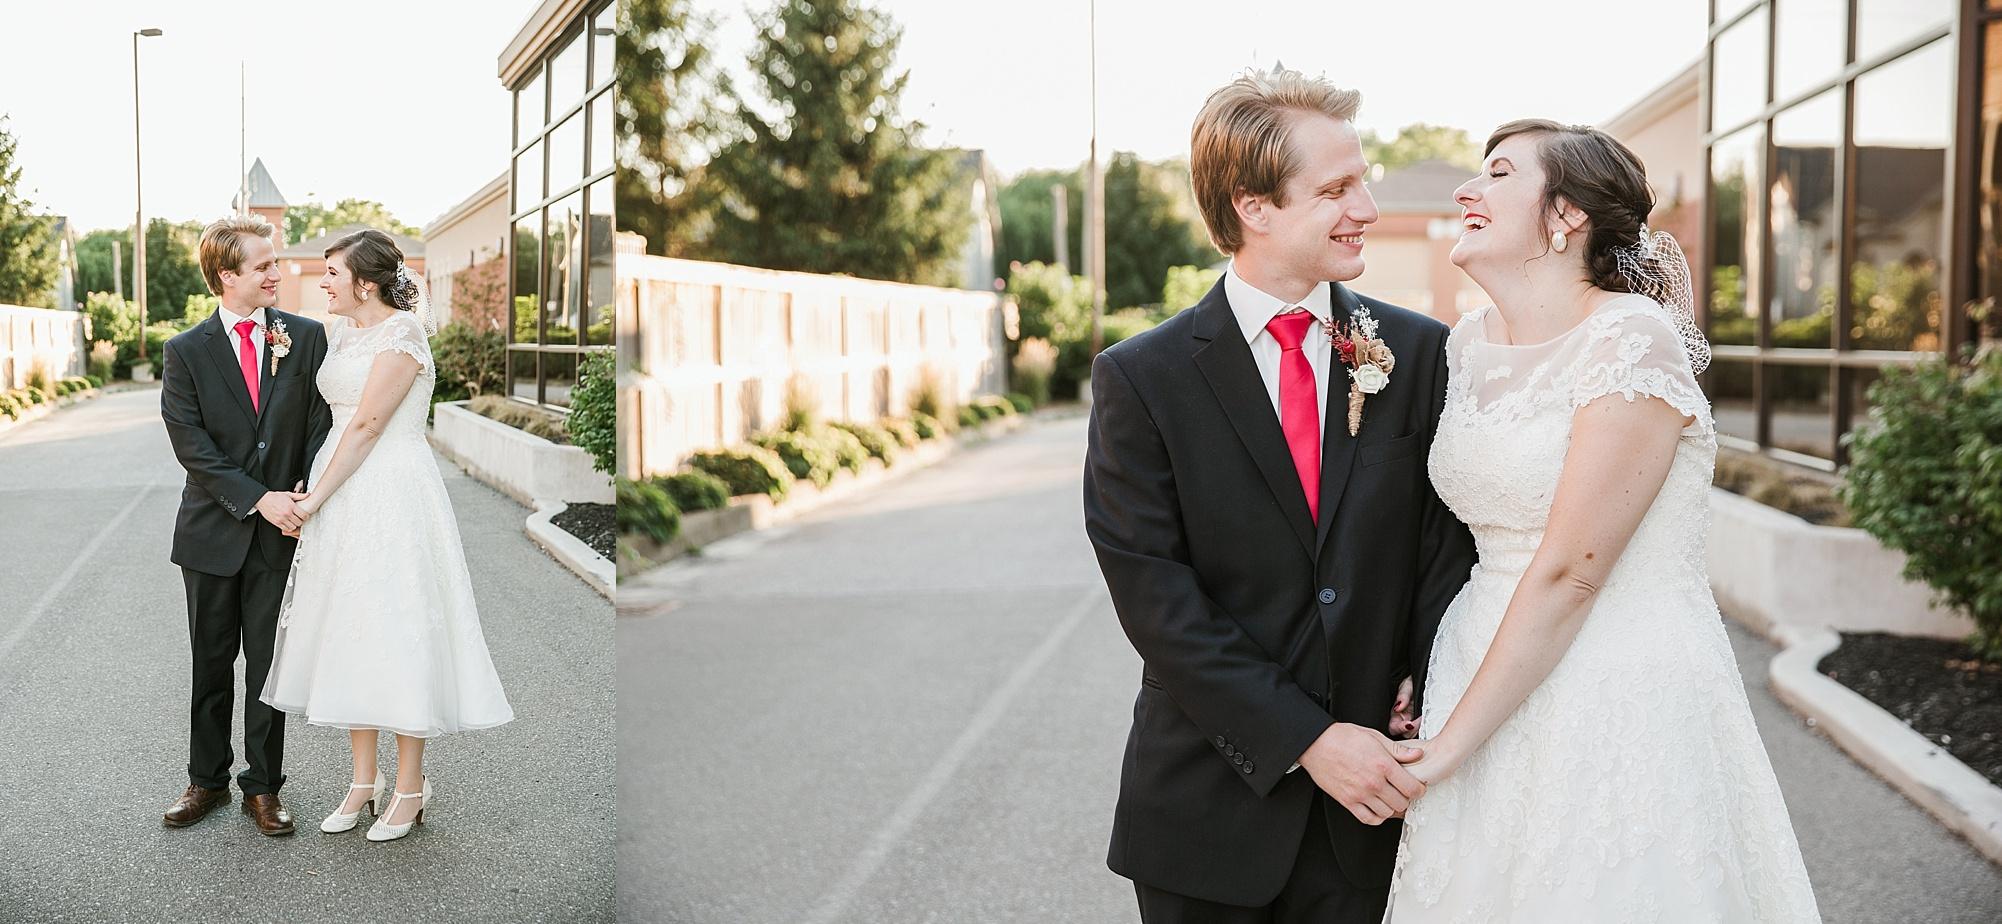 decewfalls-wedding_0045.jpg